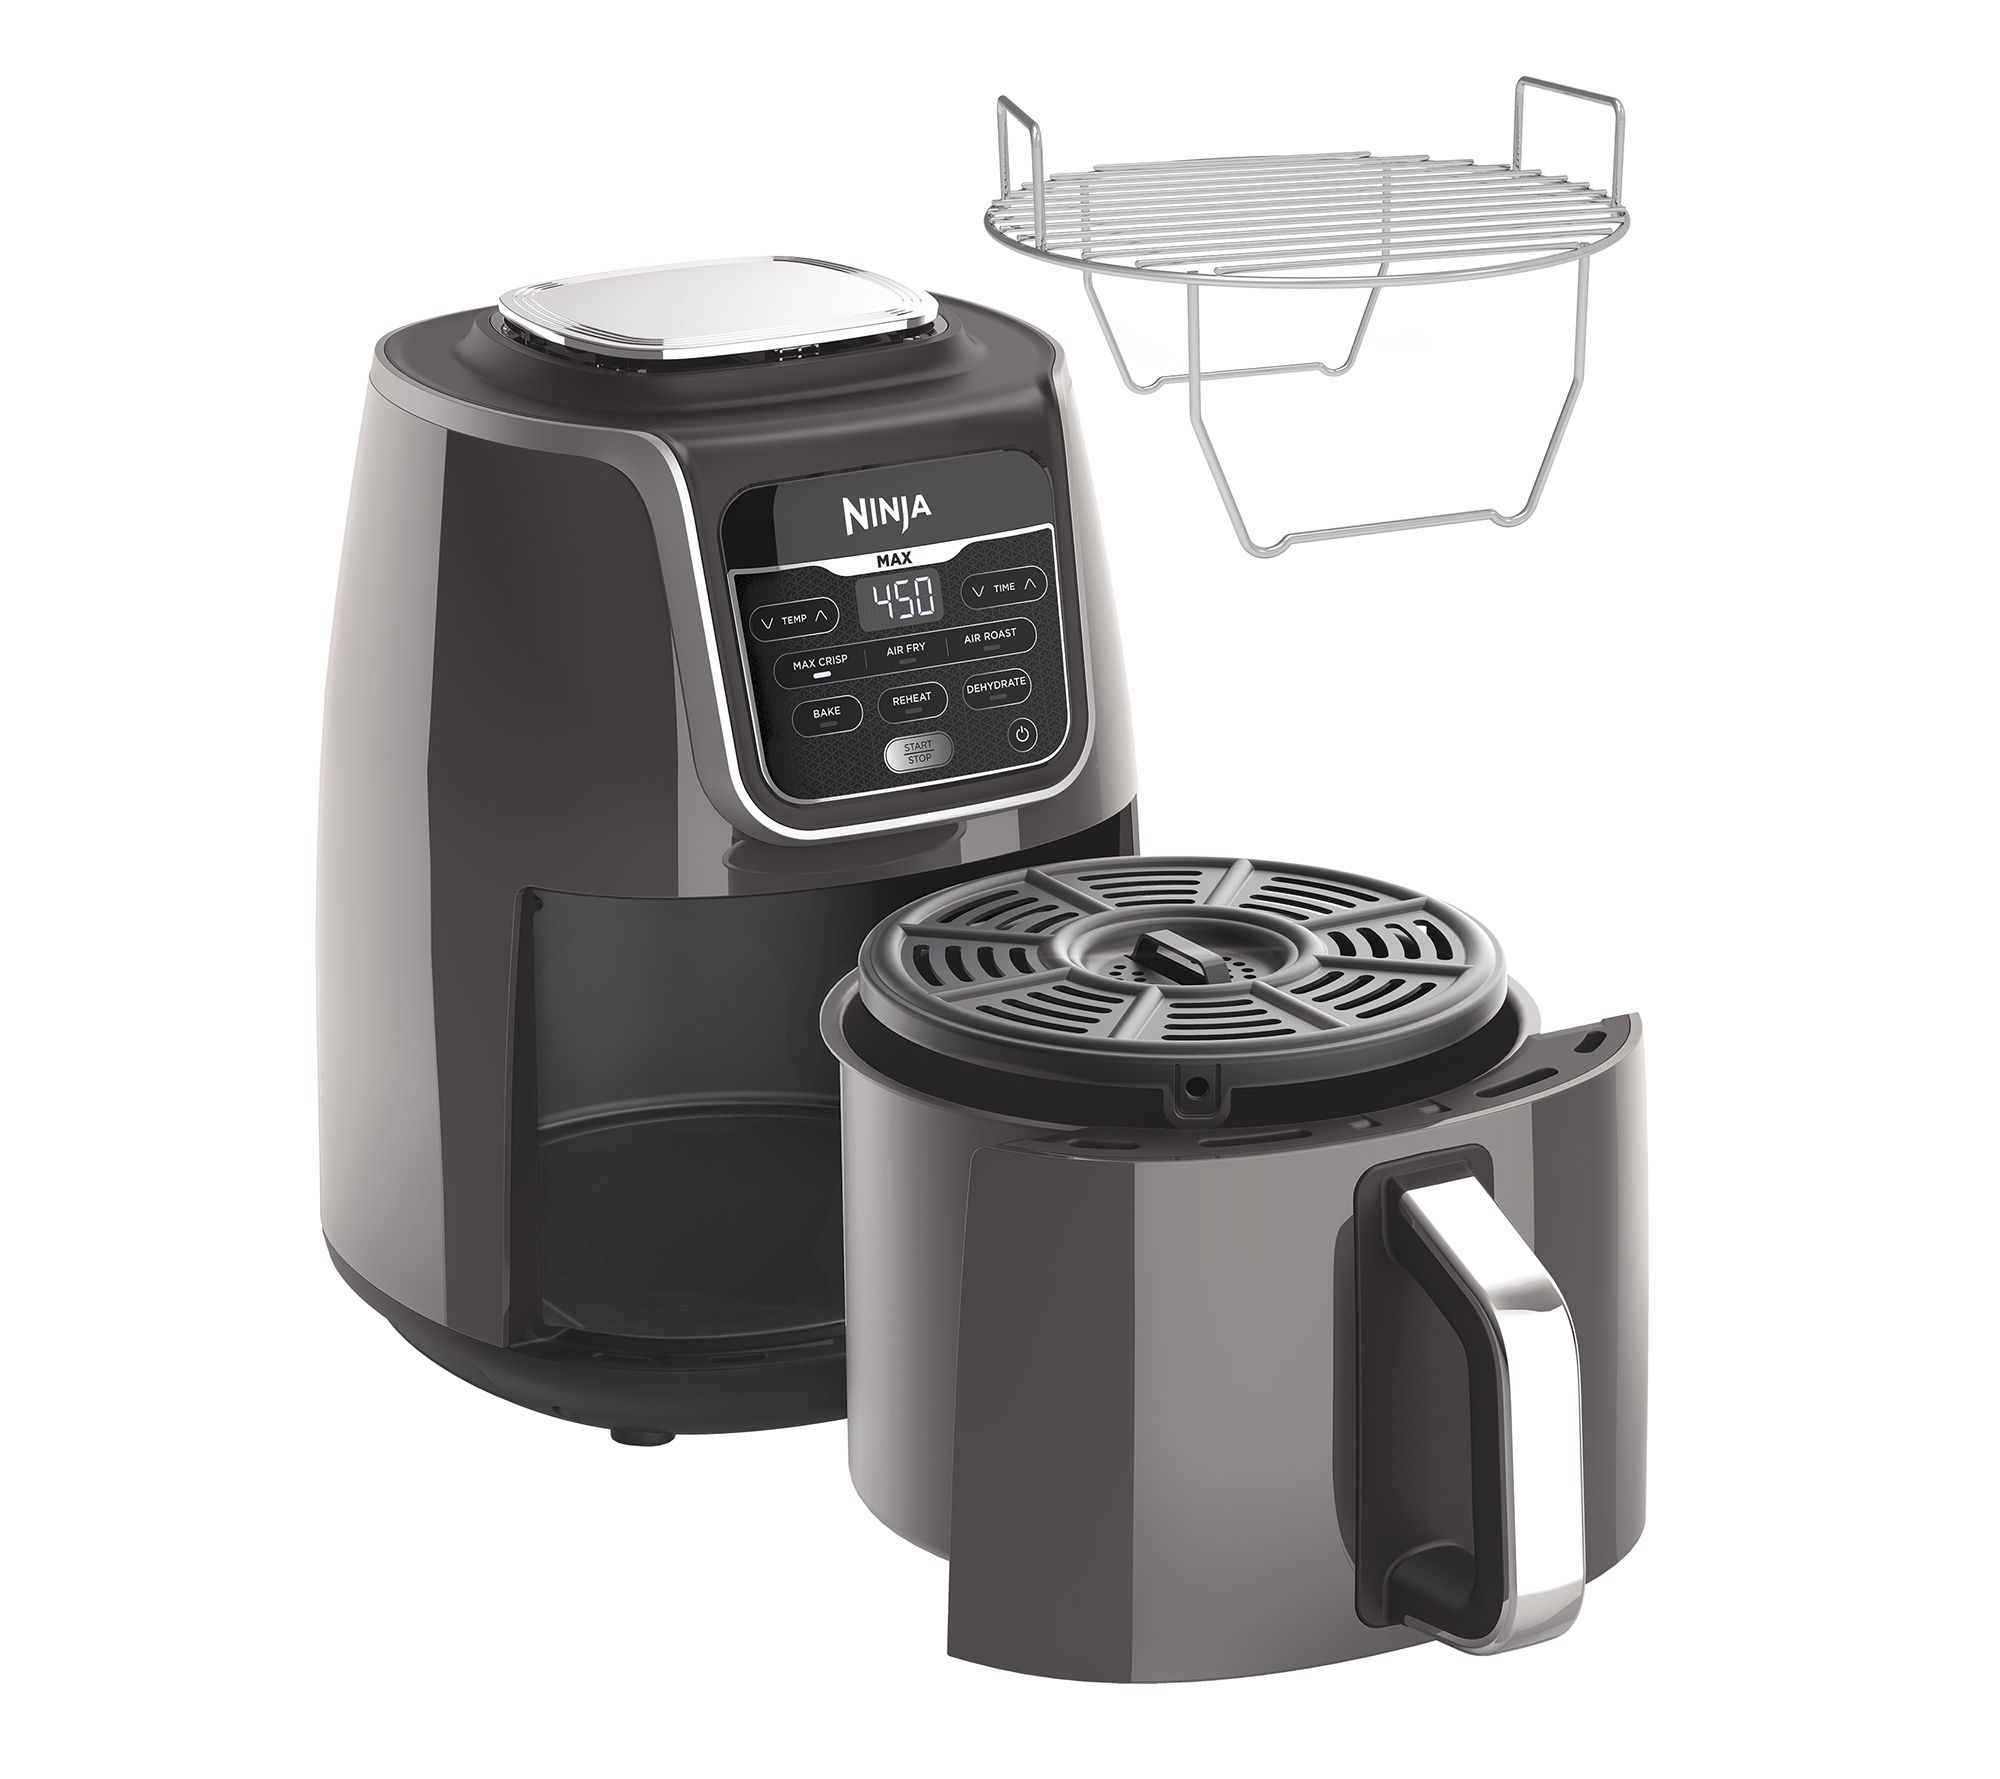 Ninja 5 5 Qt Air Fryer Max Xl With Maxcrisp Technology Qvc Com